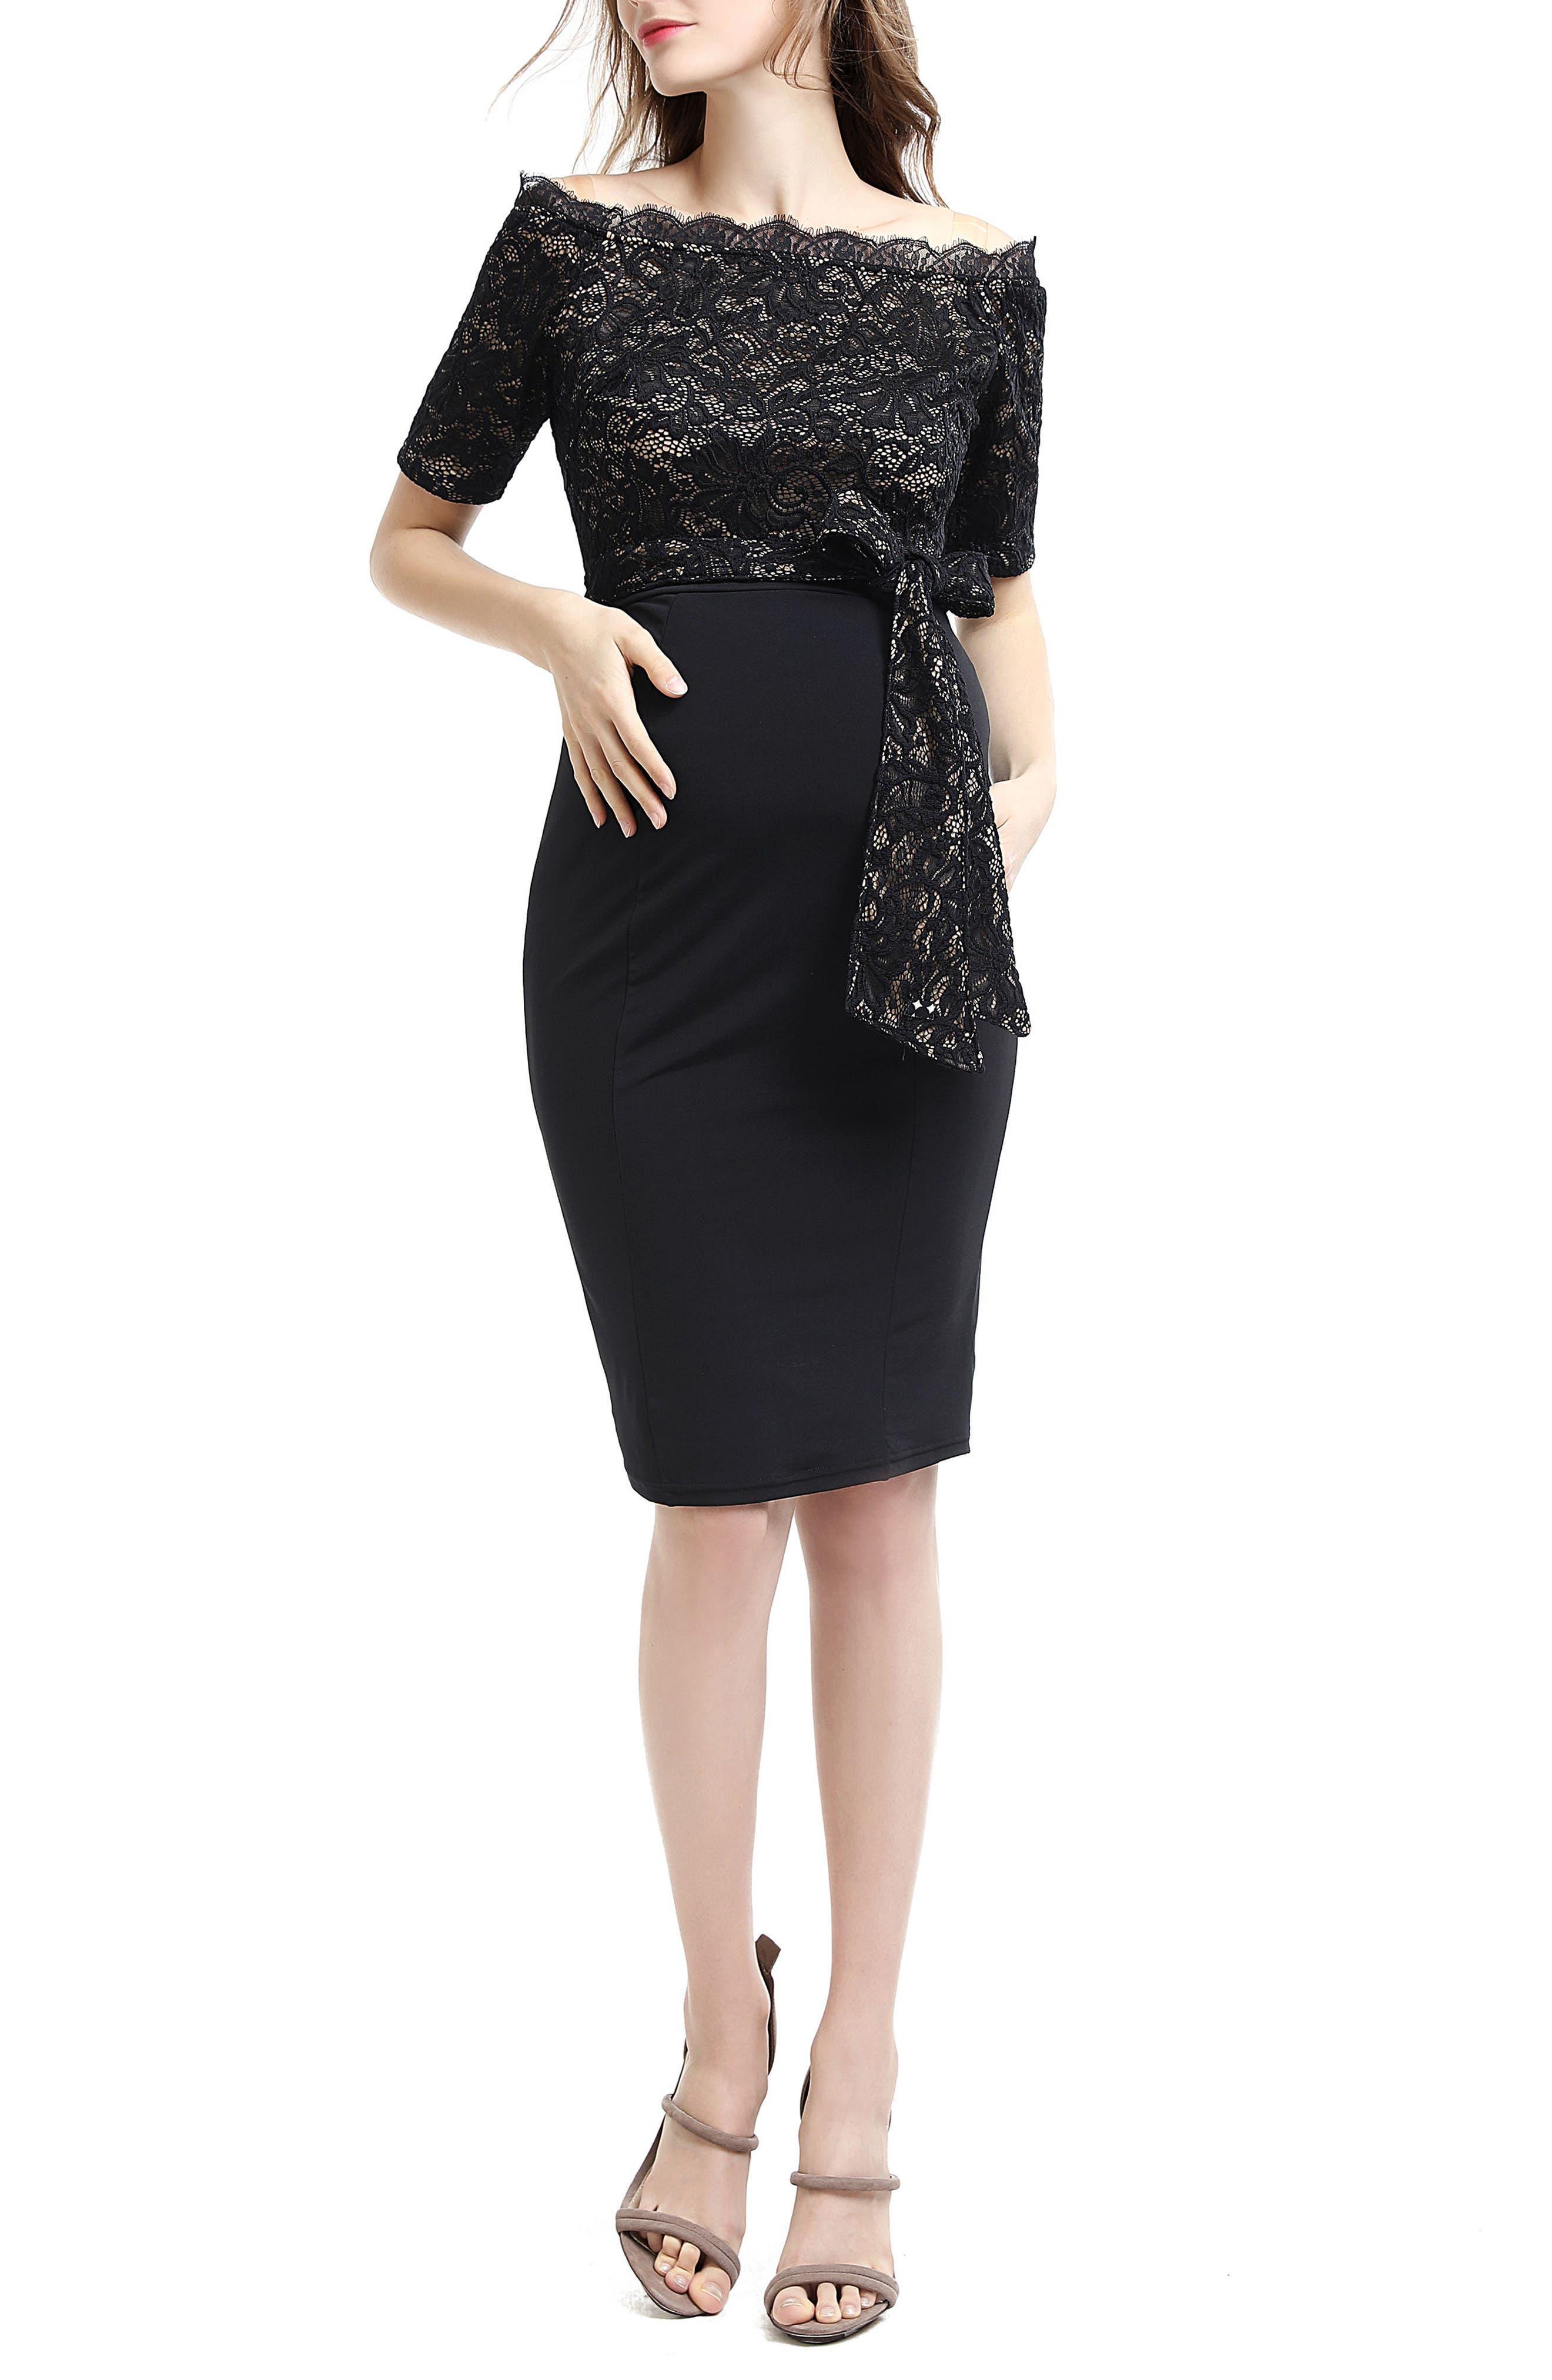 Madeline Off the Shoulder Maternity Dress,                             Main thumbnail 1, color,                             Black